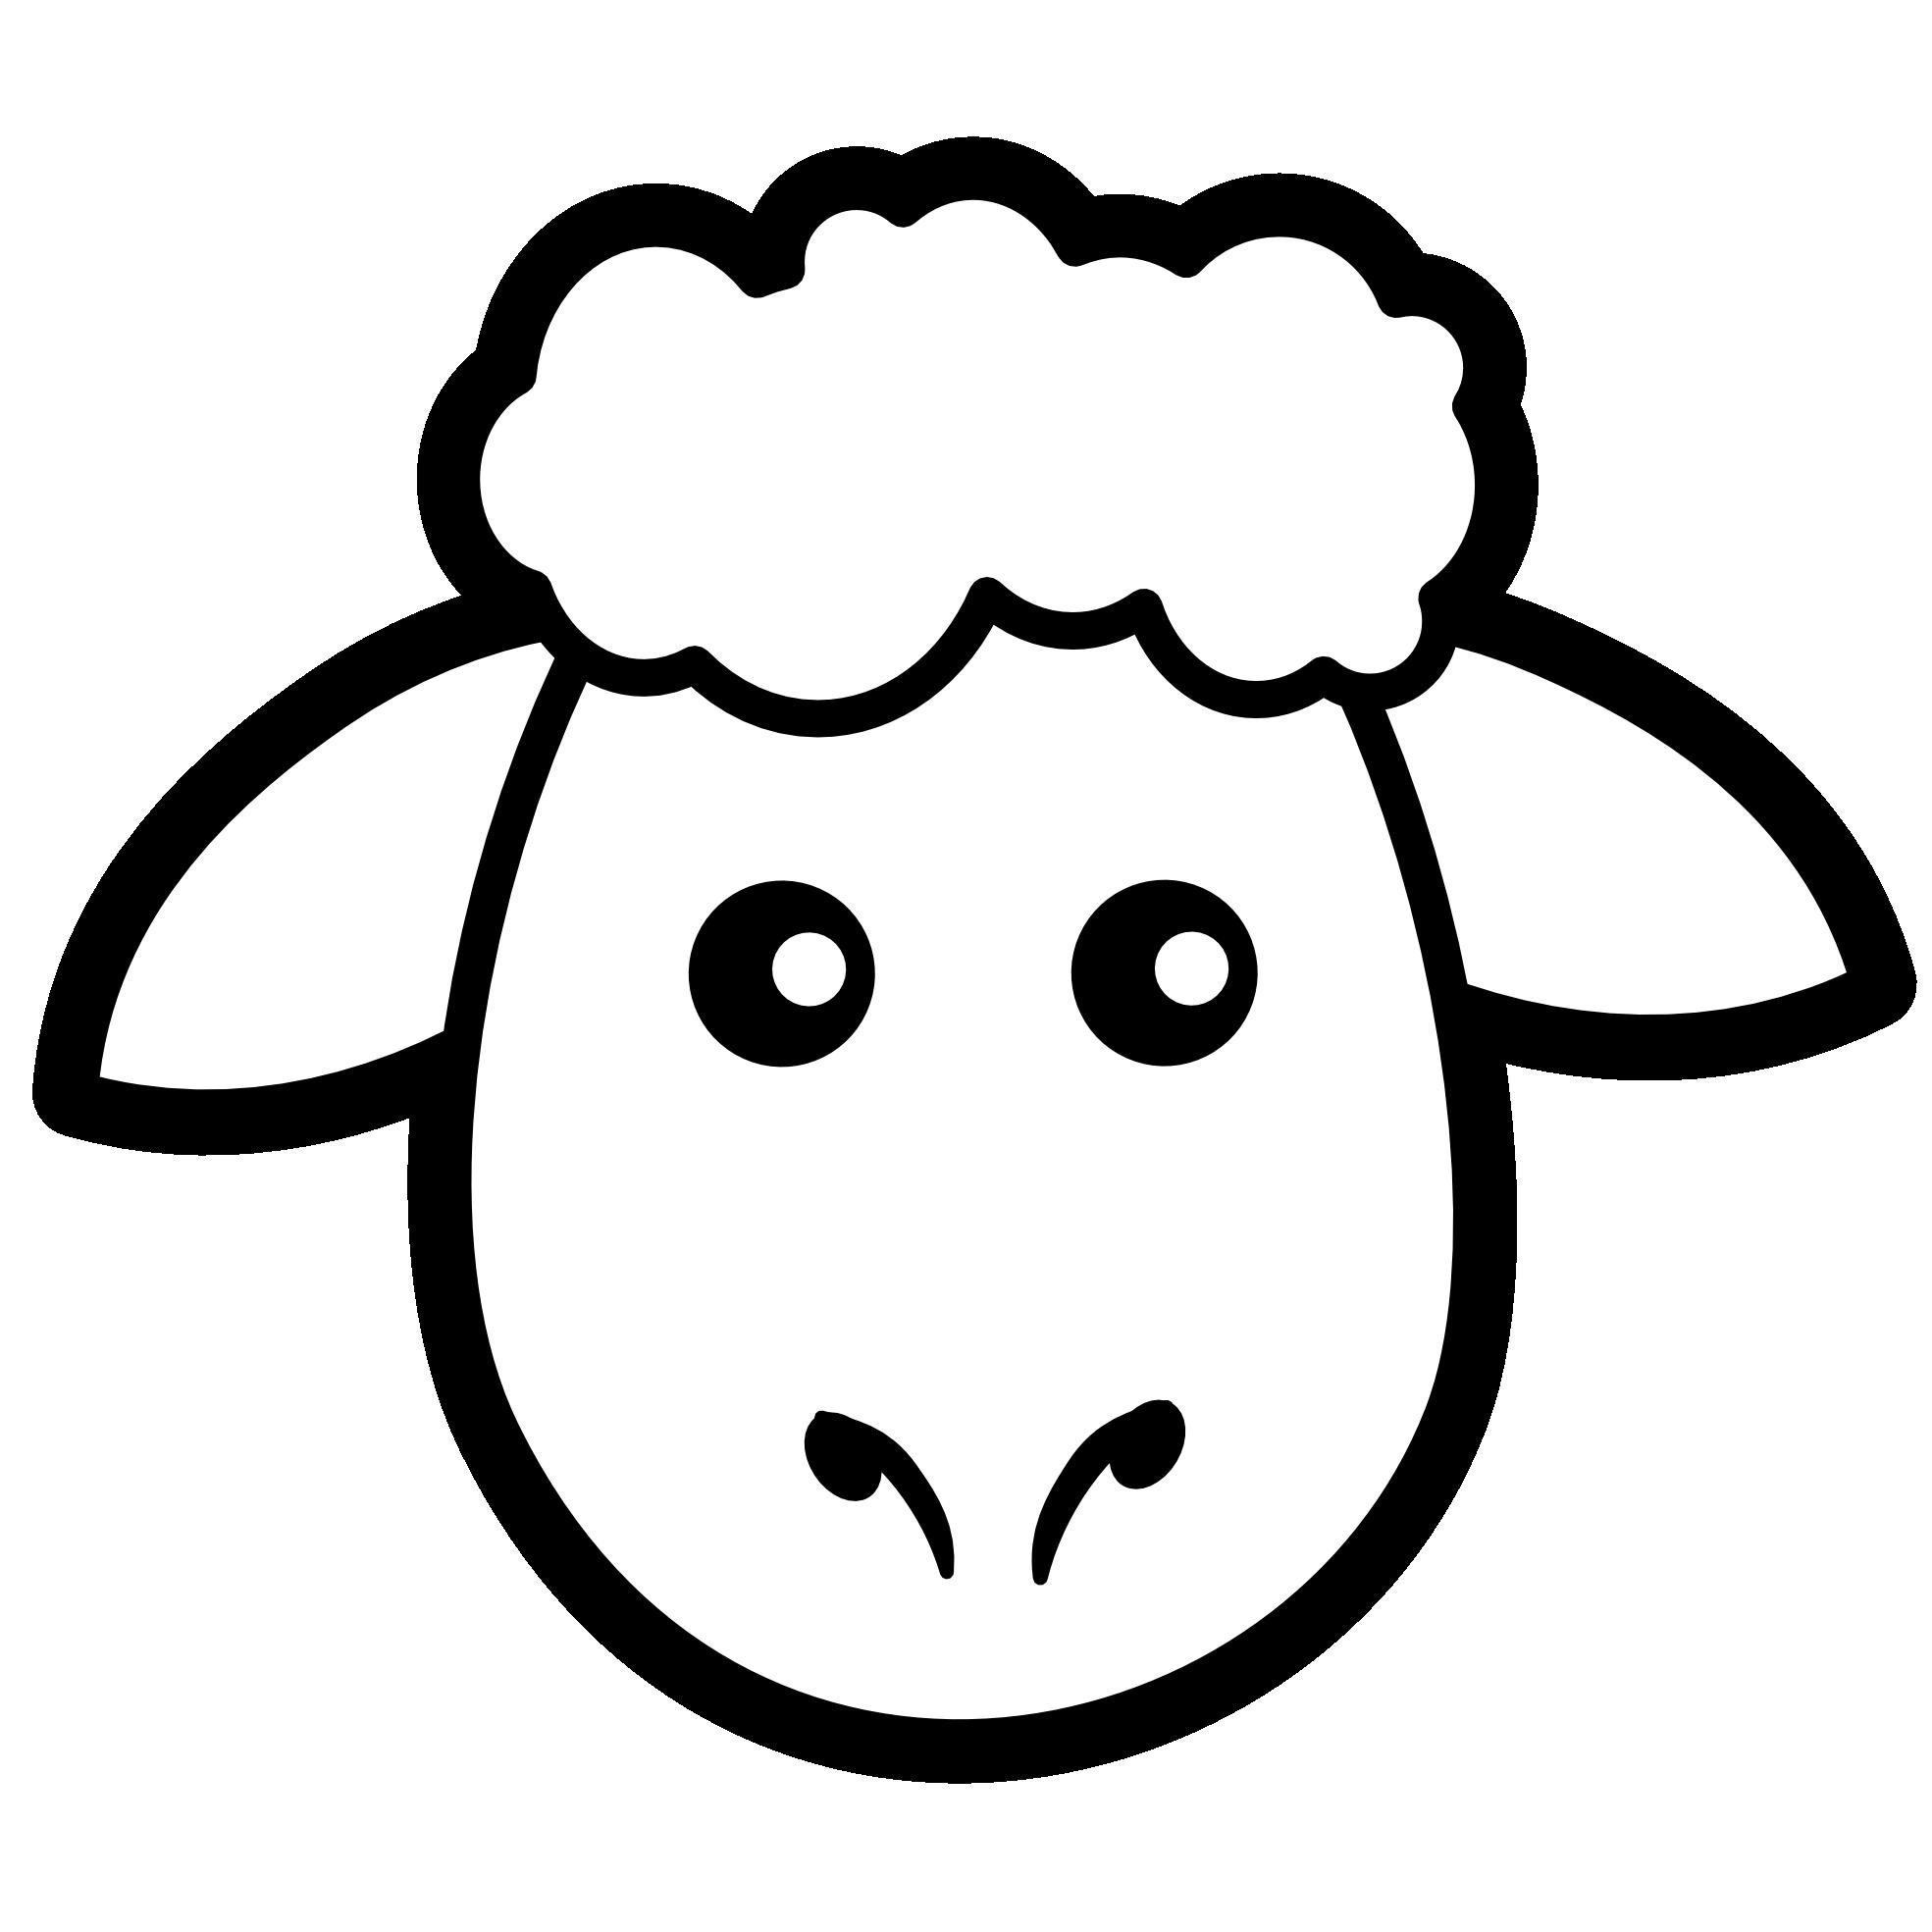 Clipart sheep ewe, Clipart sheep ewe Transparent FREE for.